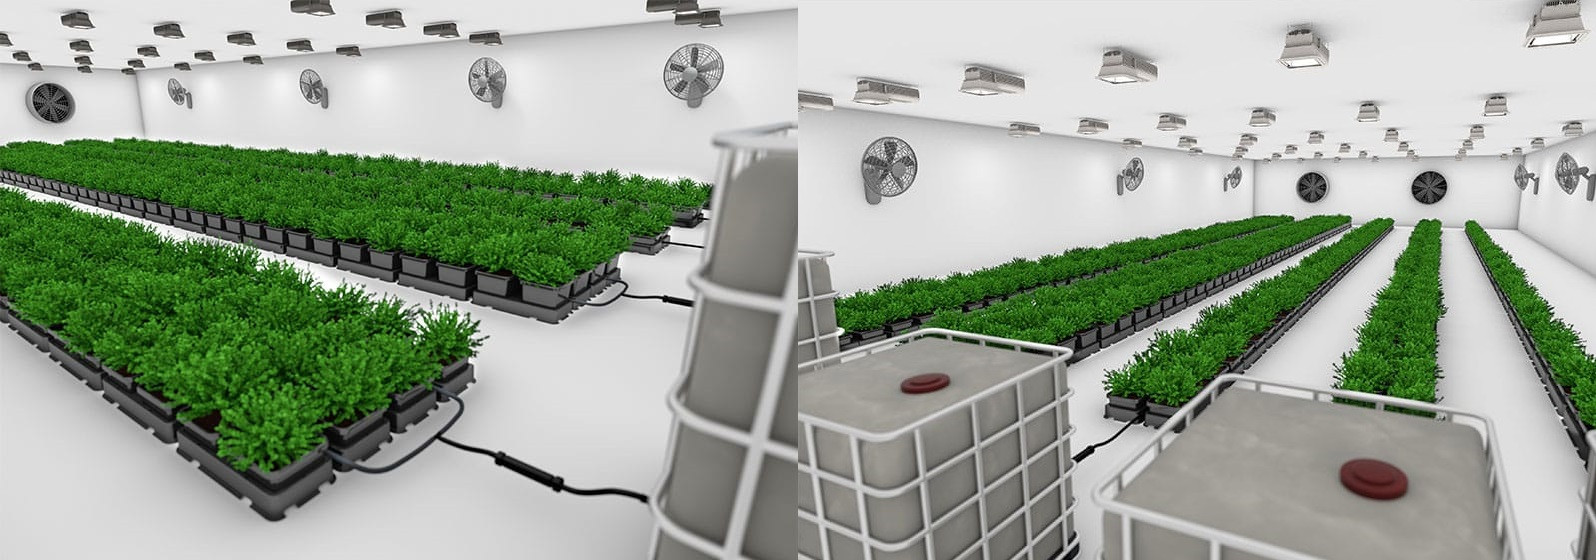 Easy2Grow 40 System Autopot - напоителна система